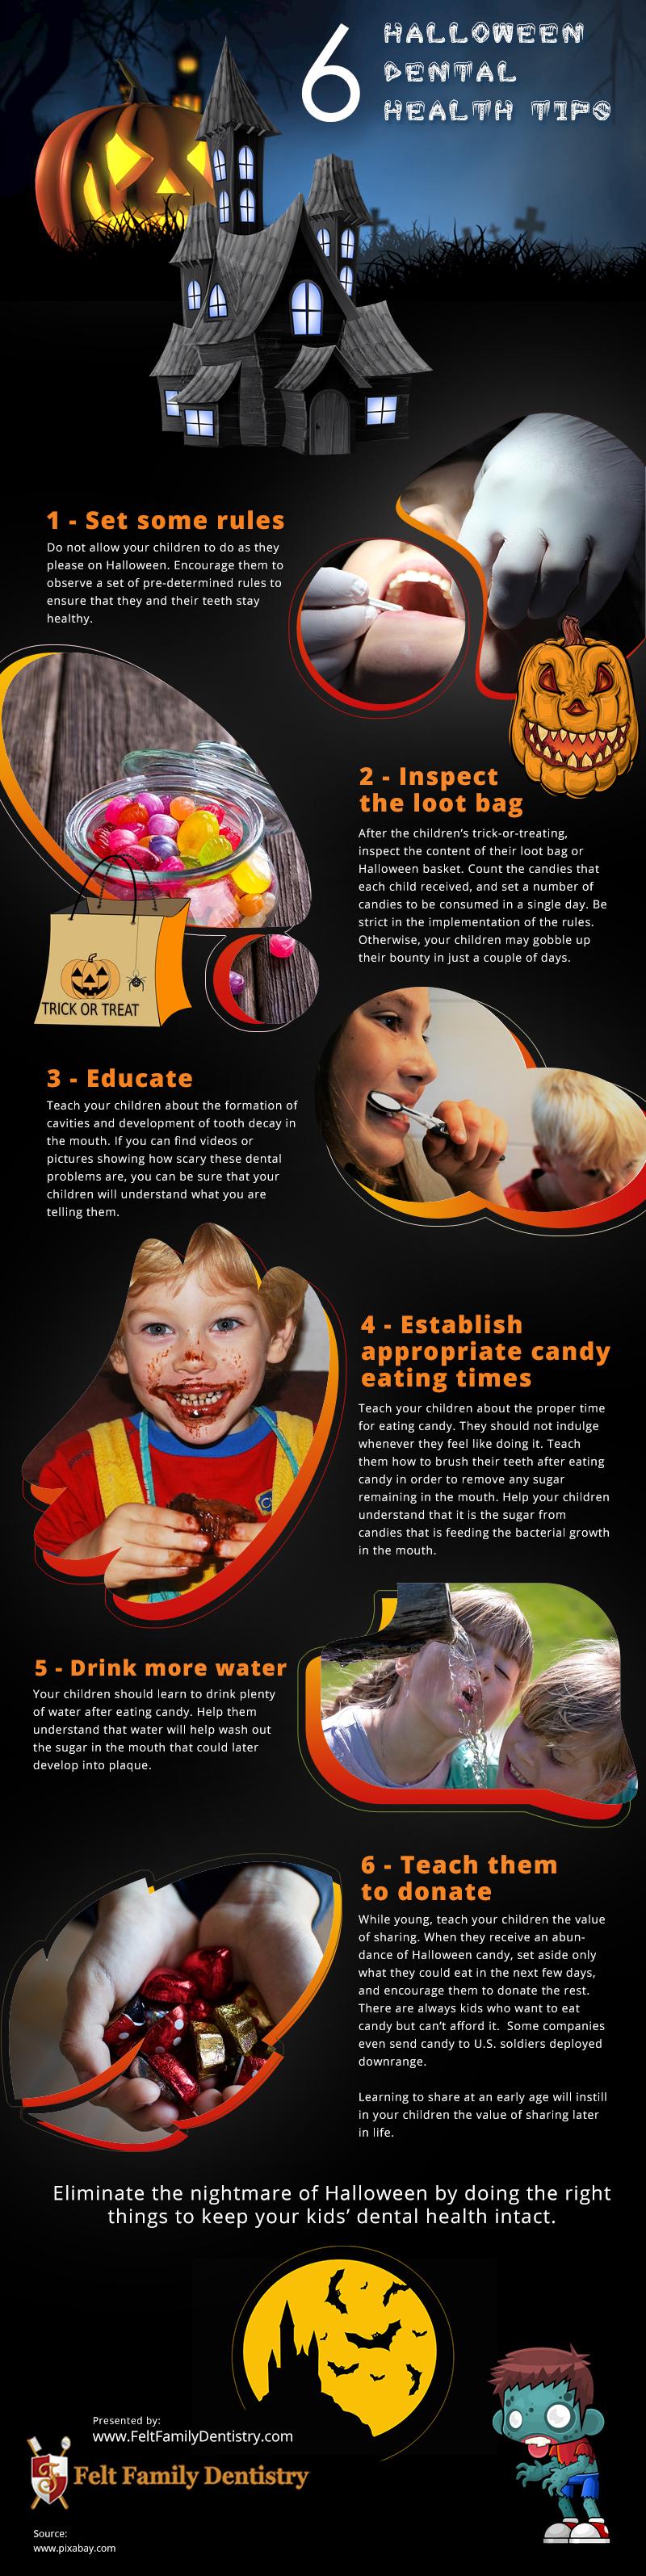 6 Halloween Dental Health Tips [infographic]